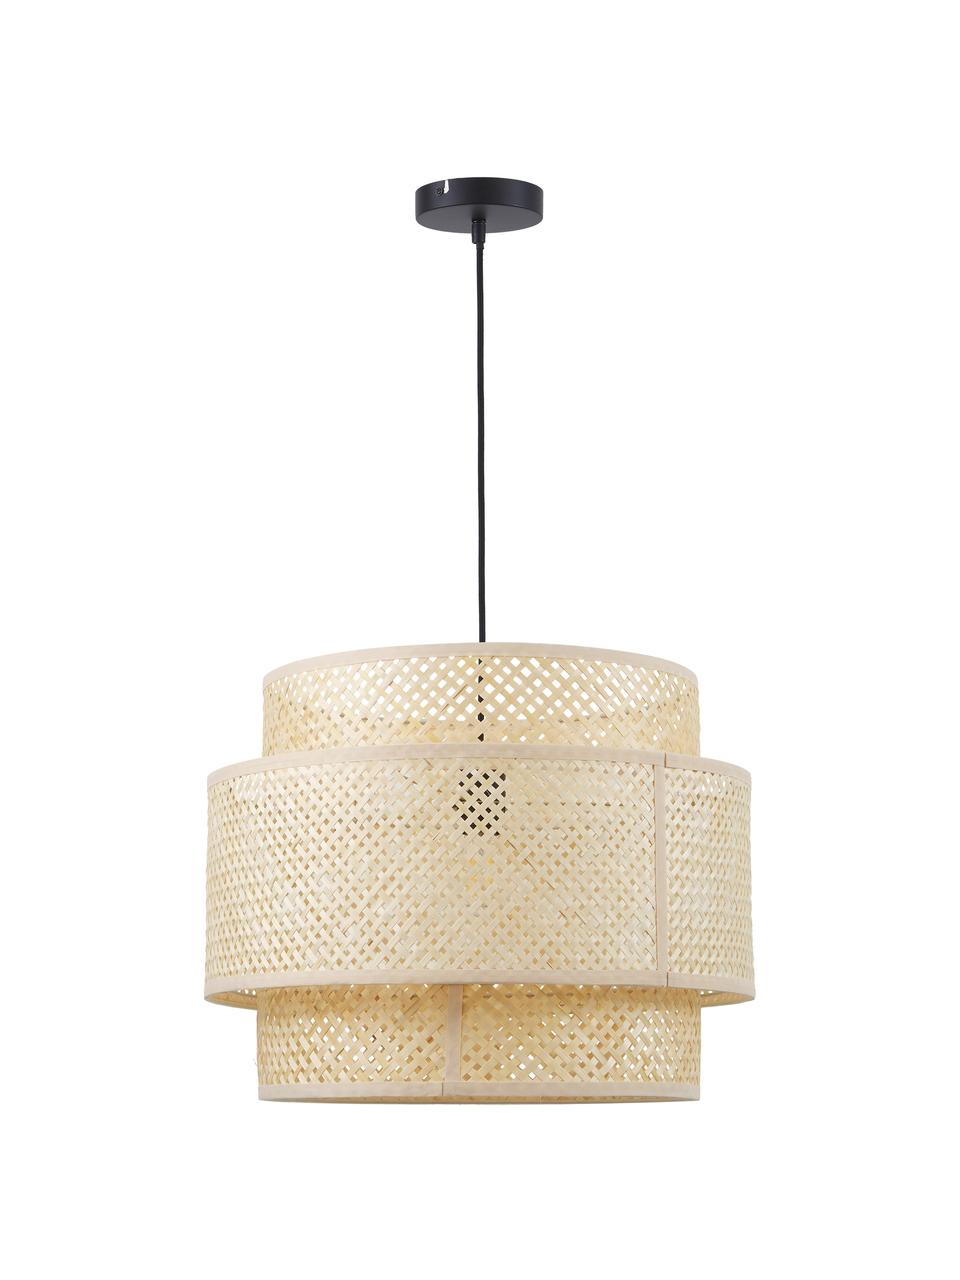 Lampada a sospensione in bambù fatta a mano Finja, Paralume: bambù, Baldacchino: metallo verniciato a polv, Beige, Ø 50 x Alt. 40 cm